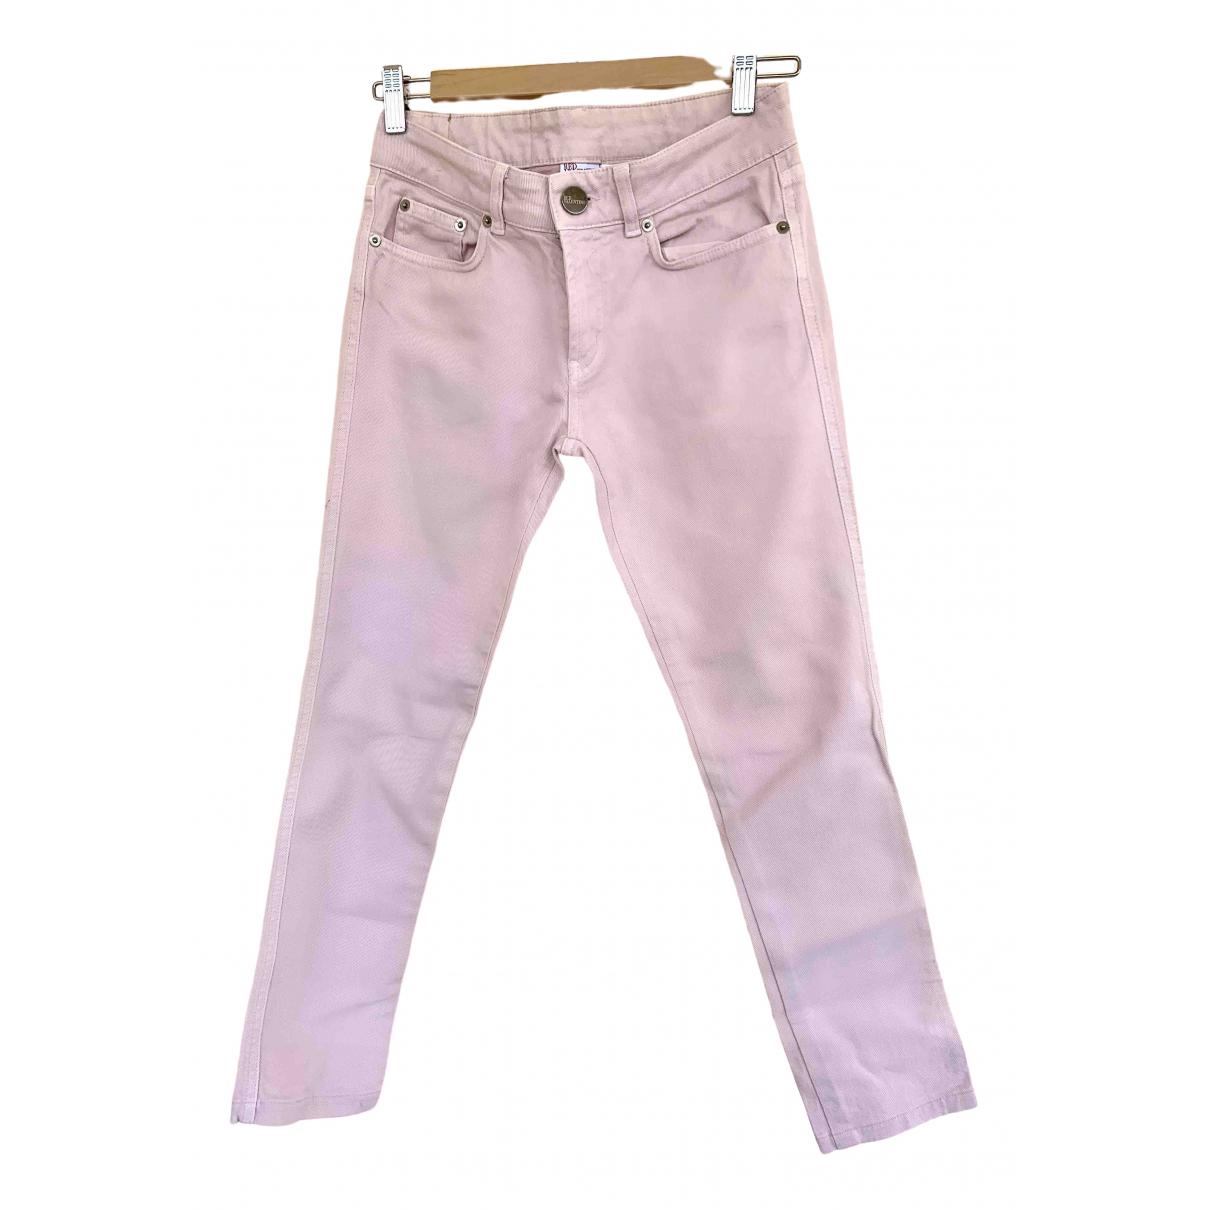 Red Valentino Garavani \N Pink Denim - Jeans Trousers for Women 38 IT